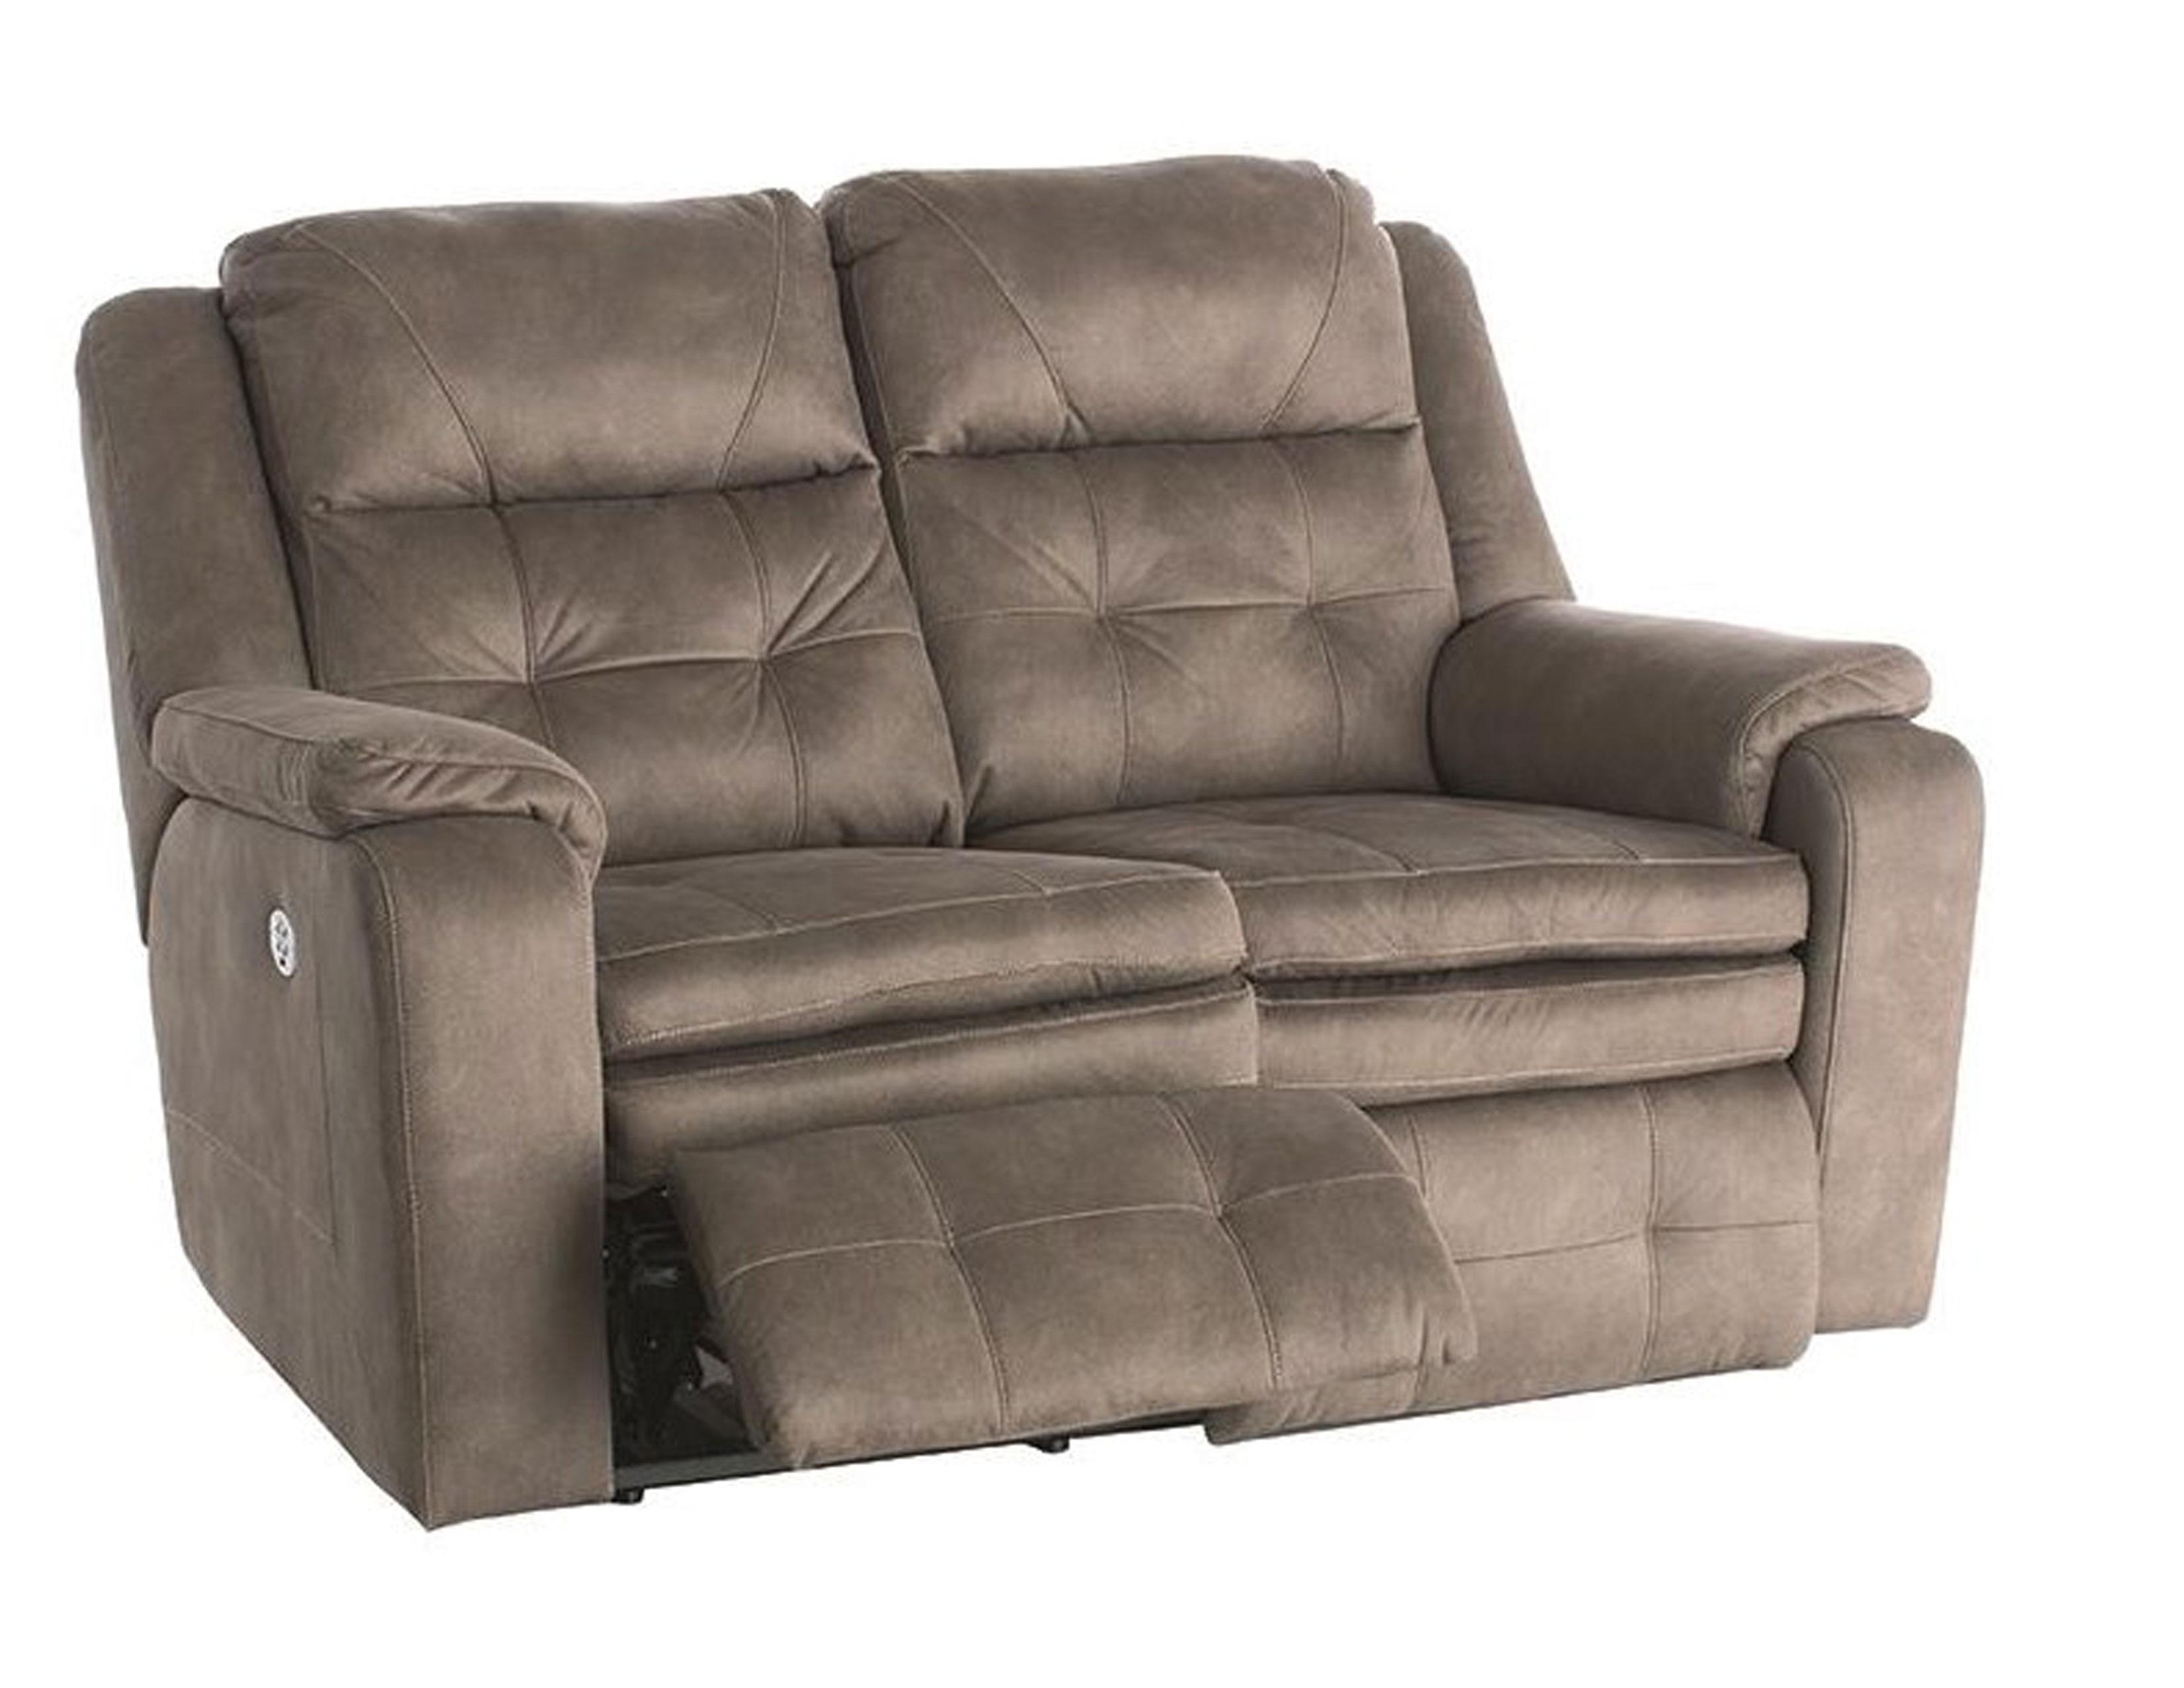 Sensational Inspire Reclining Sofa 140 Fabrics And Sofas And Sectionals Uwap Interior Chair Design Uwaporg